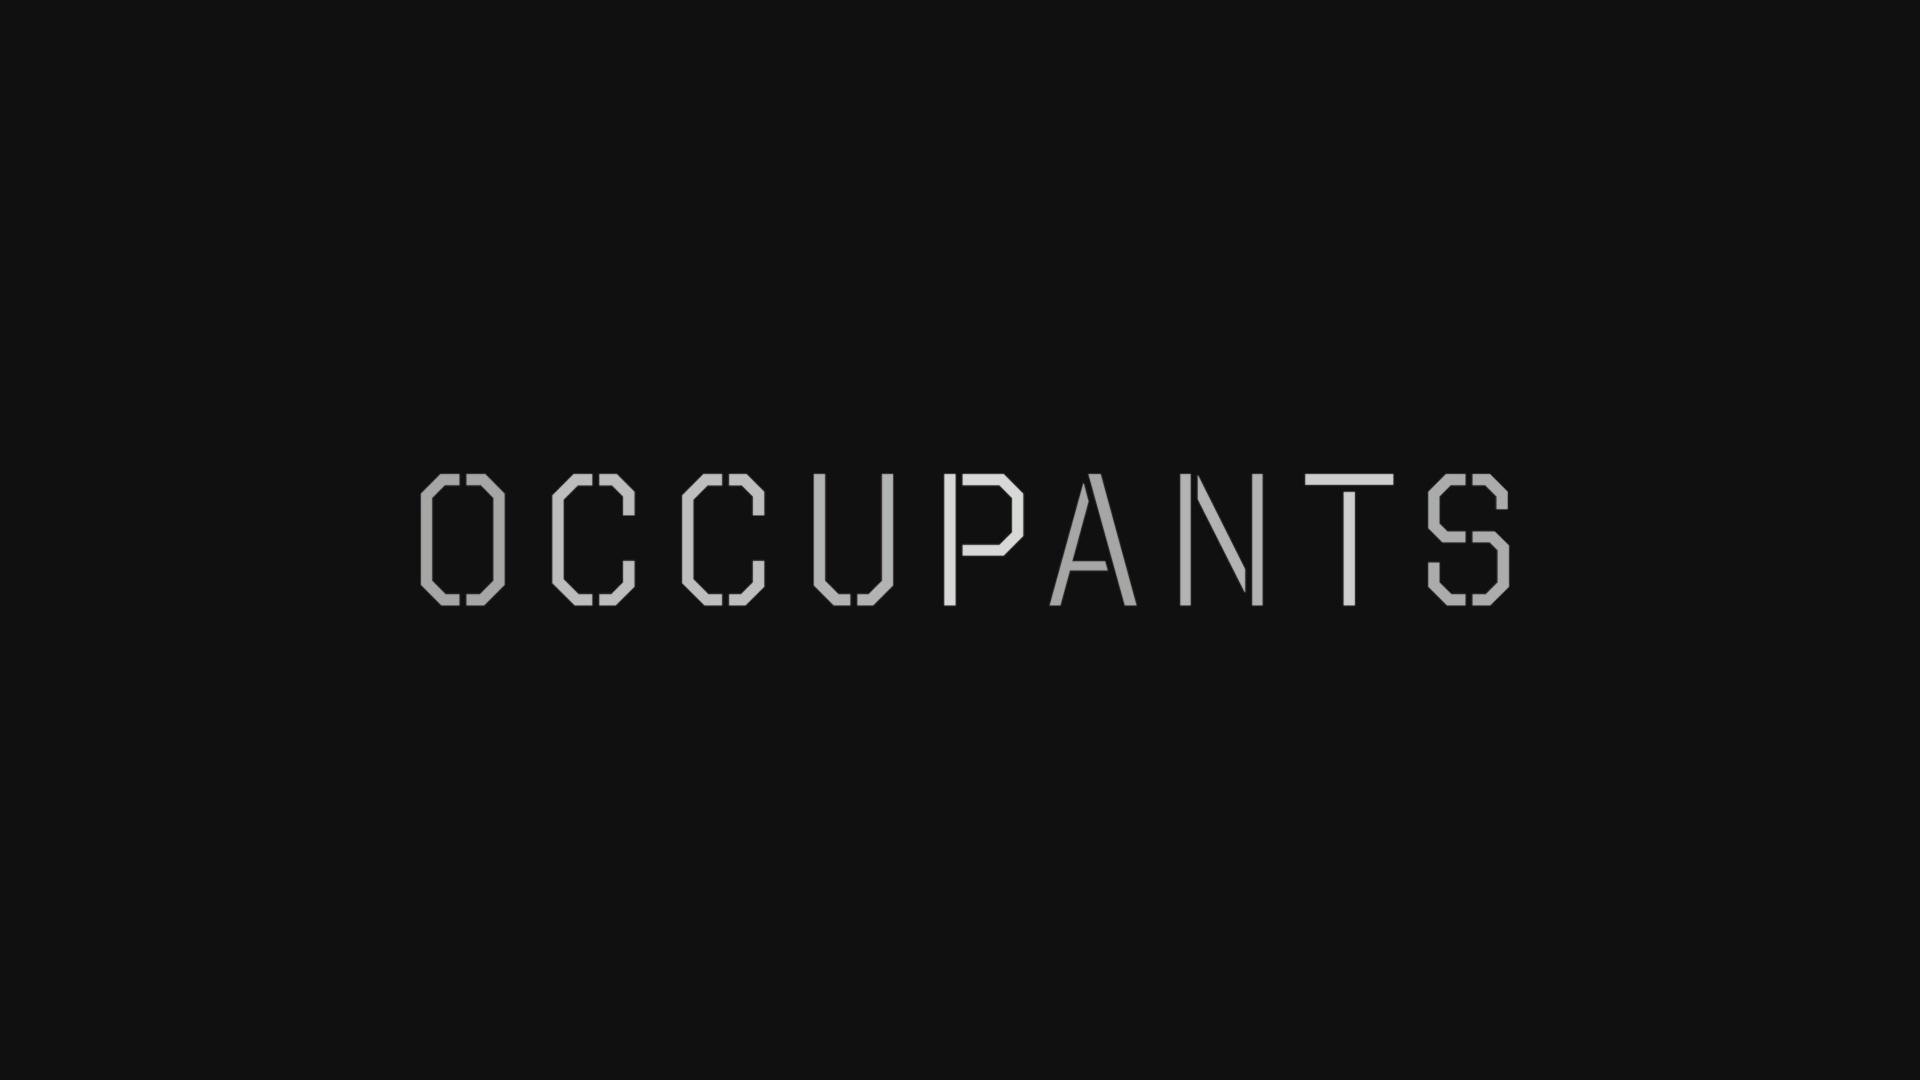 Occupants.jpg